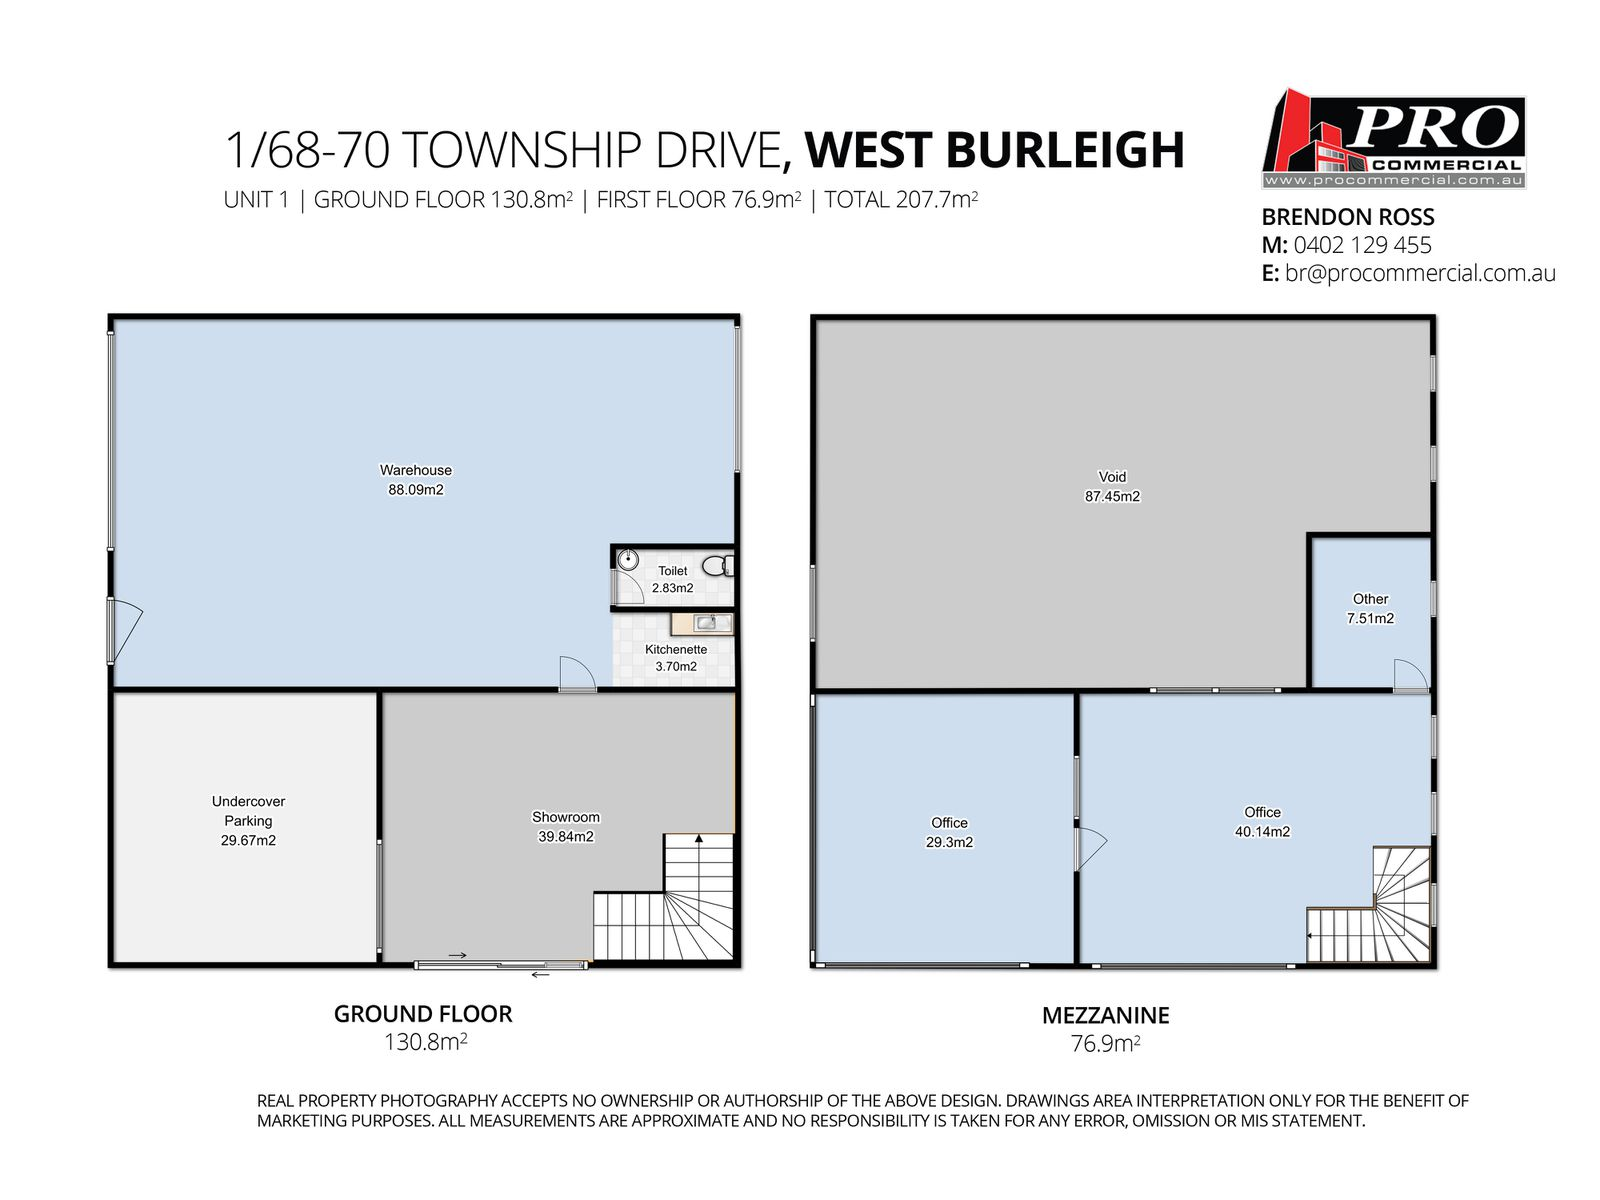 1/68-70 Township Drive, Burleigh Heads